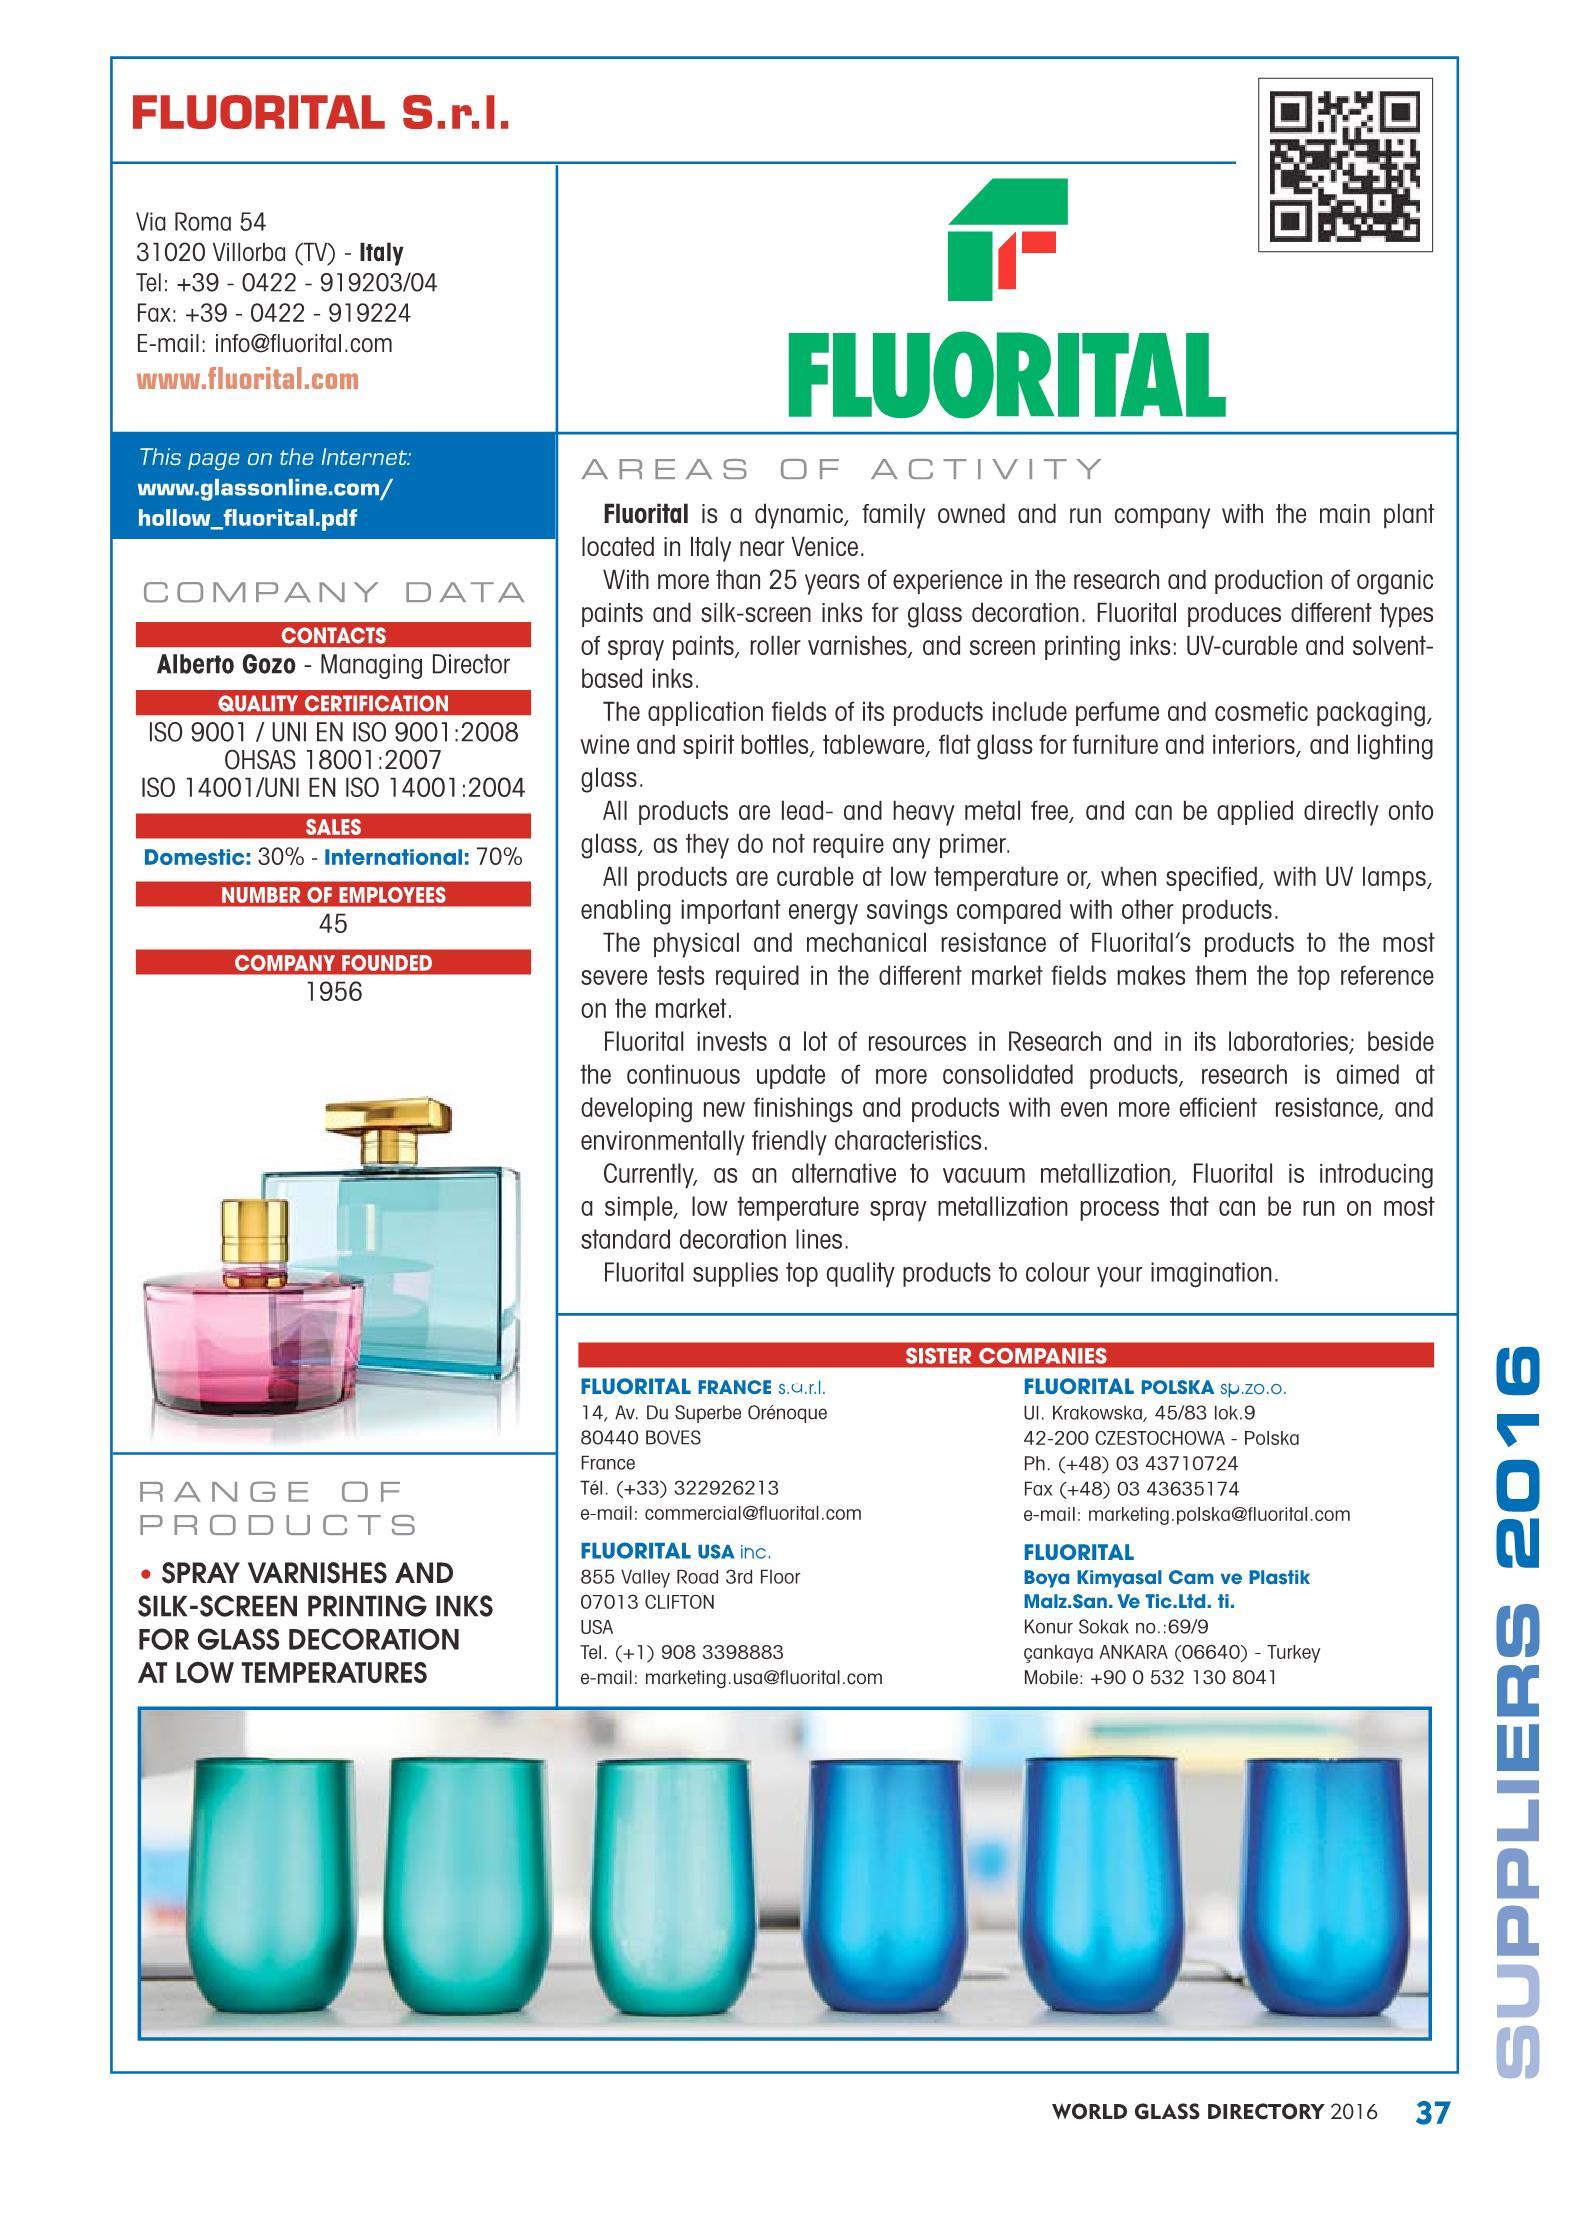 World Glass Directory 2016